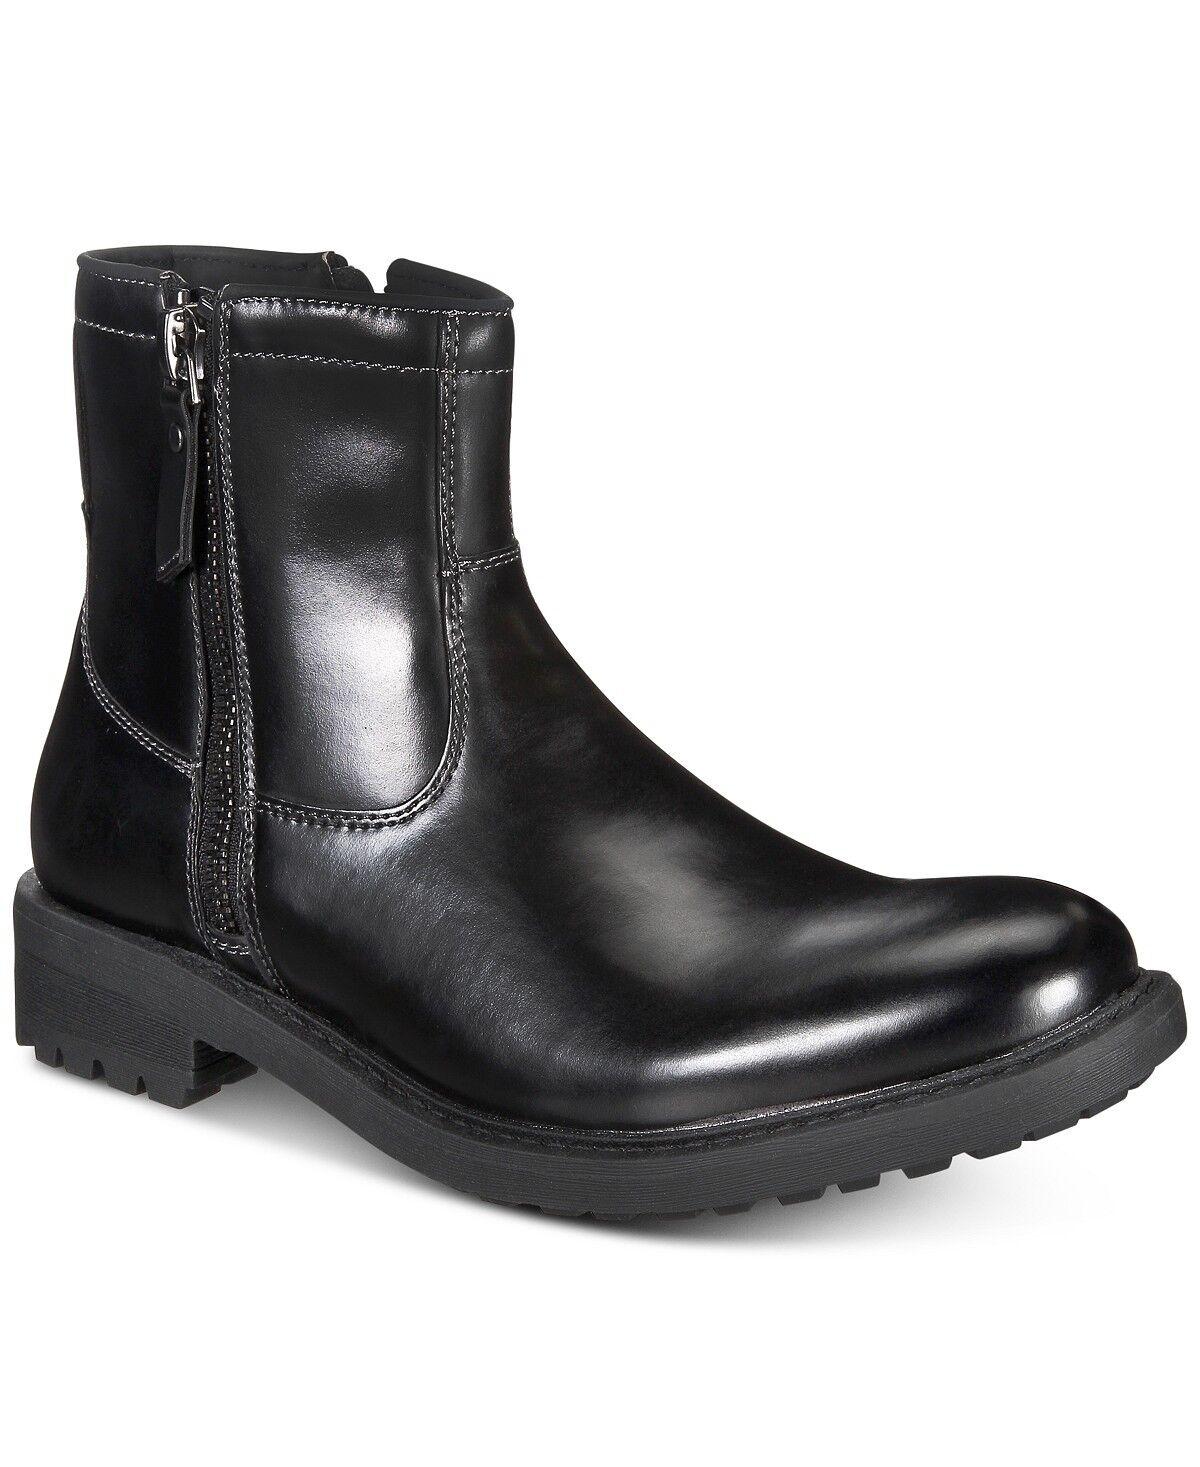 BNIB Kenneth Cole Reaction Unlisted Men's C-Roam Zip-Up Boot SZ 10.5 DS